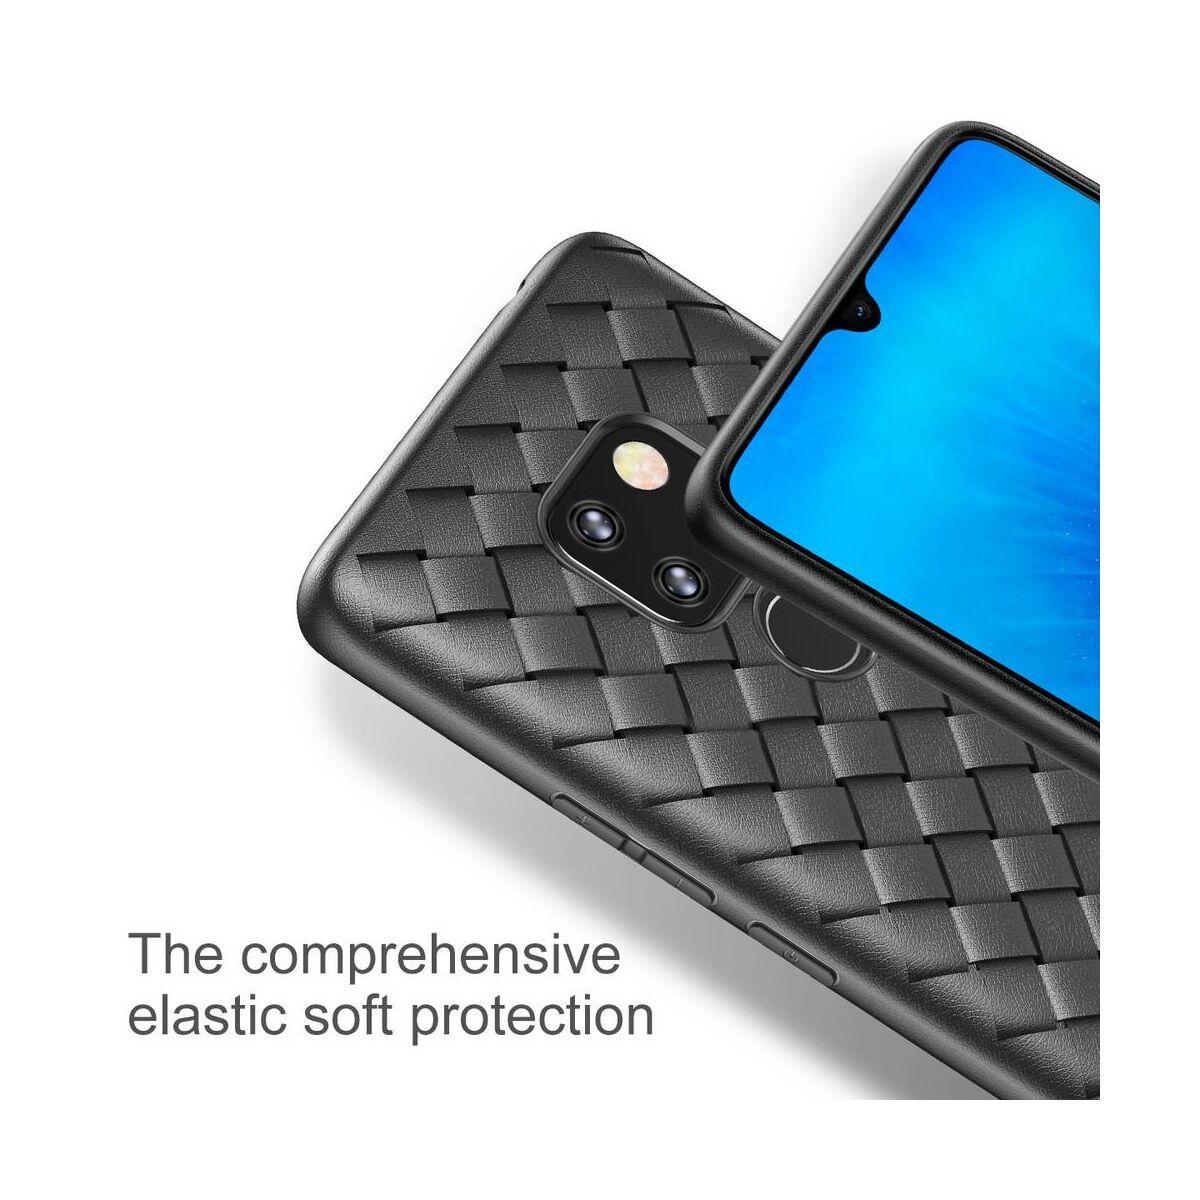 Baseus Huawei Mate 20 tok, BV Weaving, fekete (WIHWMATE20-BV01)